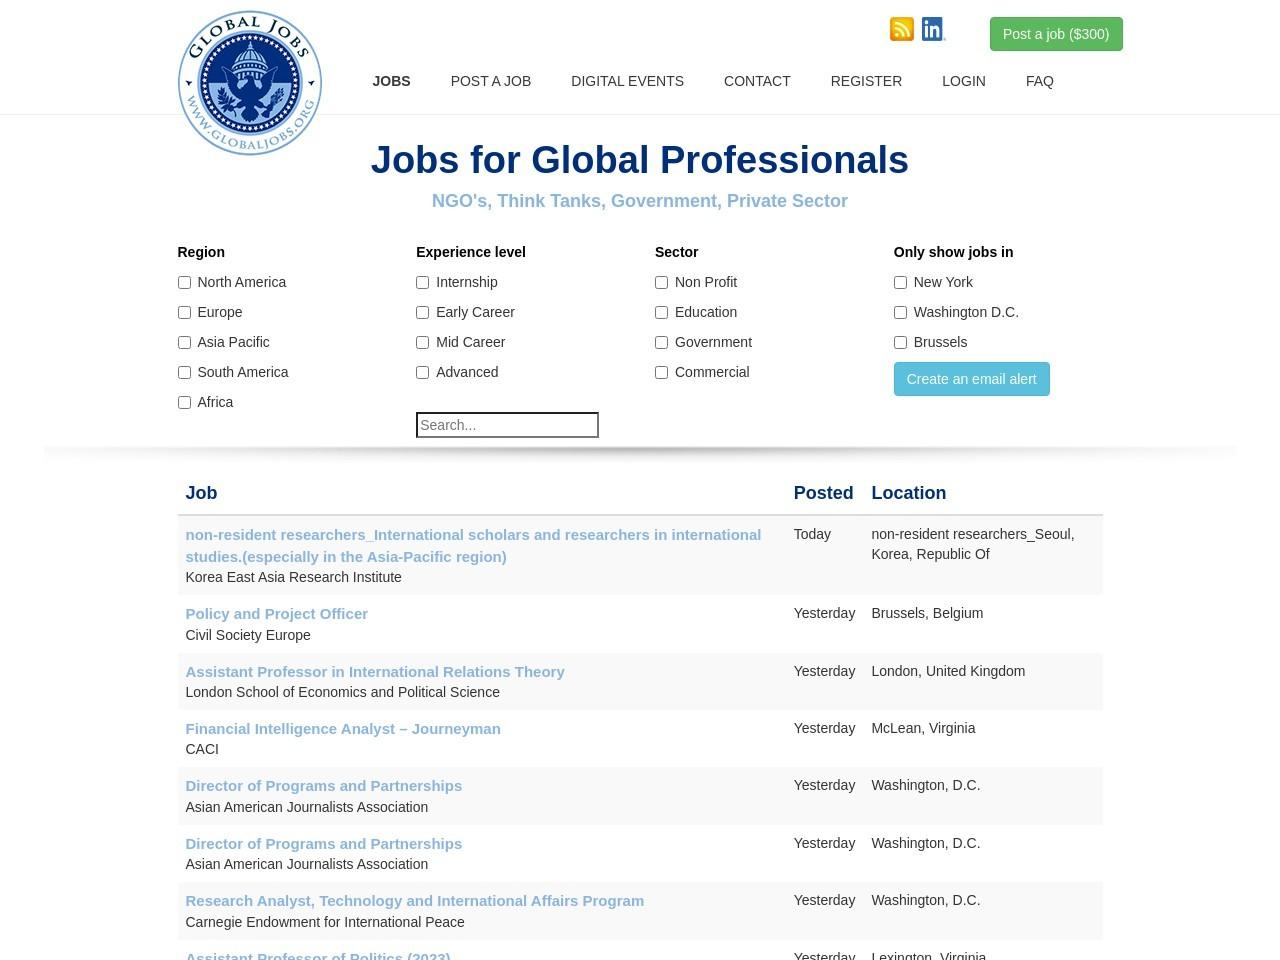 globaljobs.org